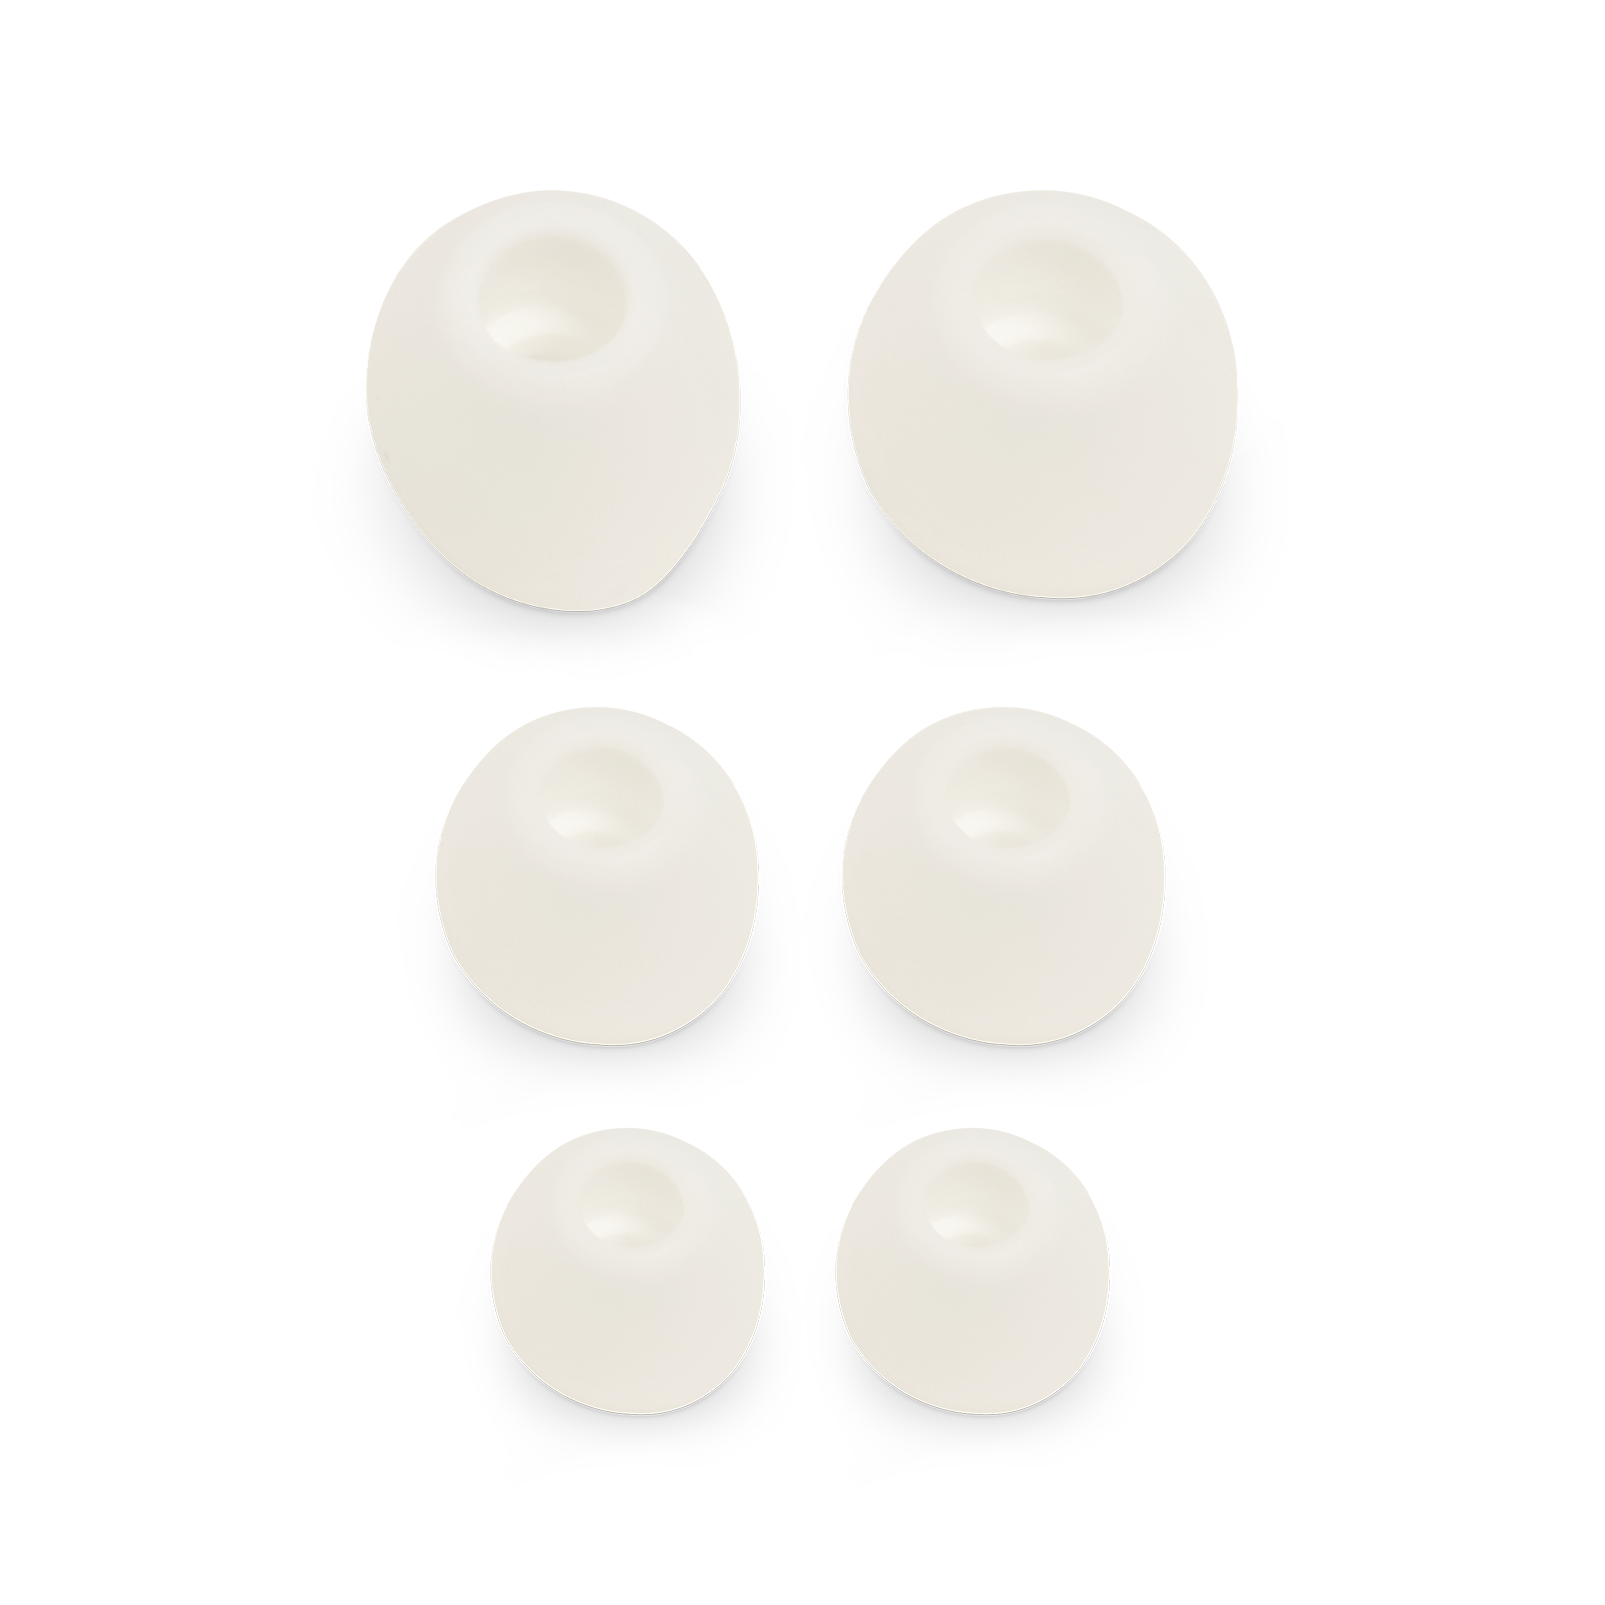 JBL Ear tip set for V110BT - Silver - Ear tips S+M+L (L+R) - Hero